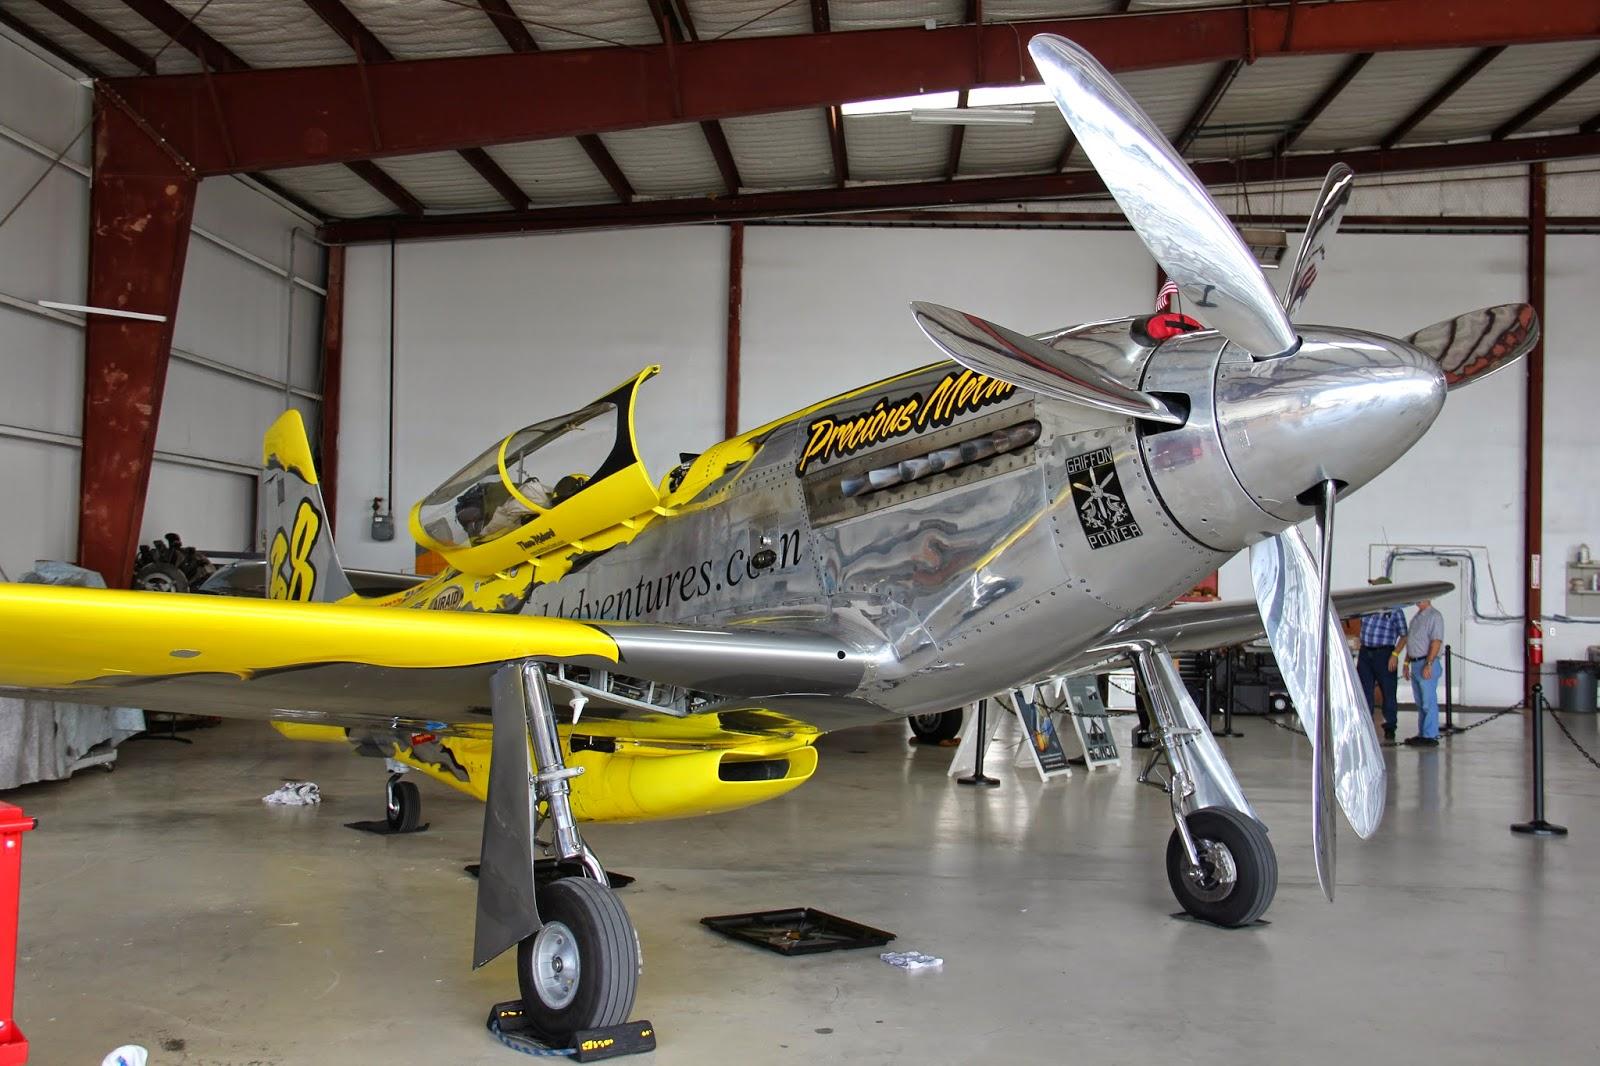 'Precious Metal' Air Racer Damaged